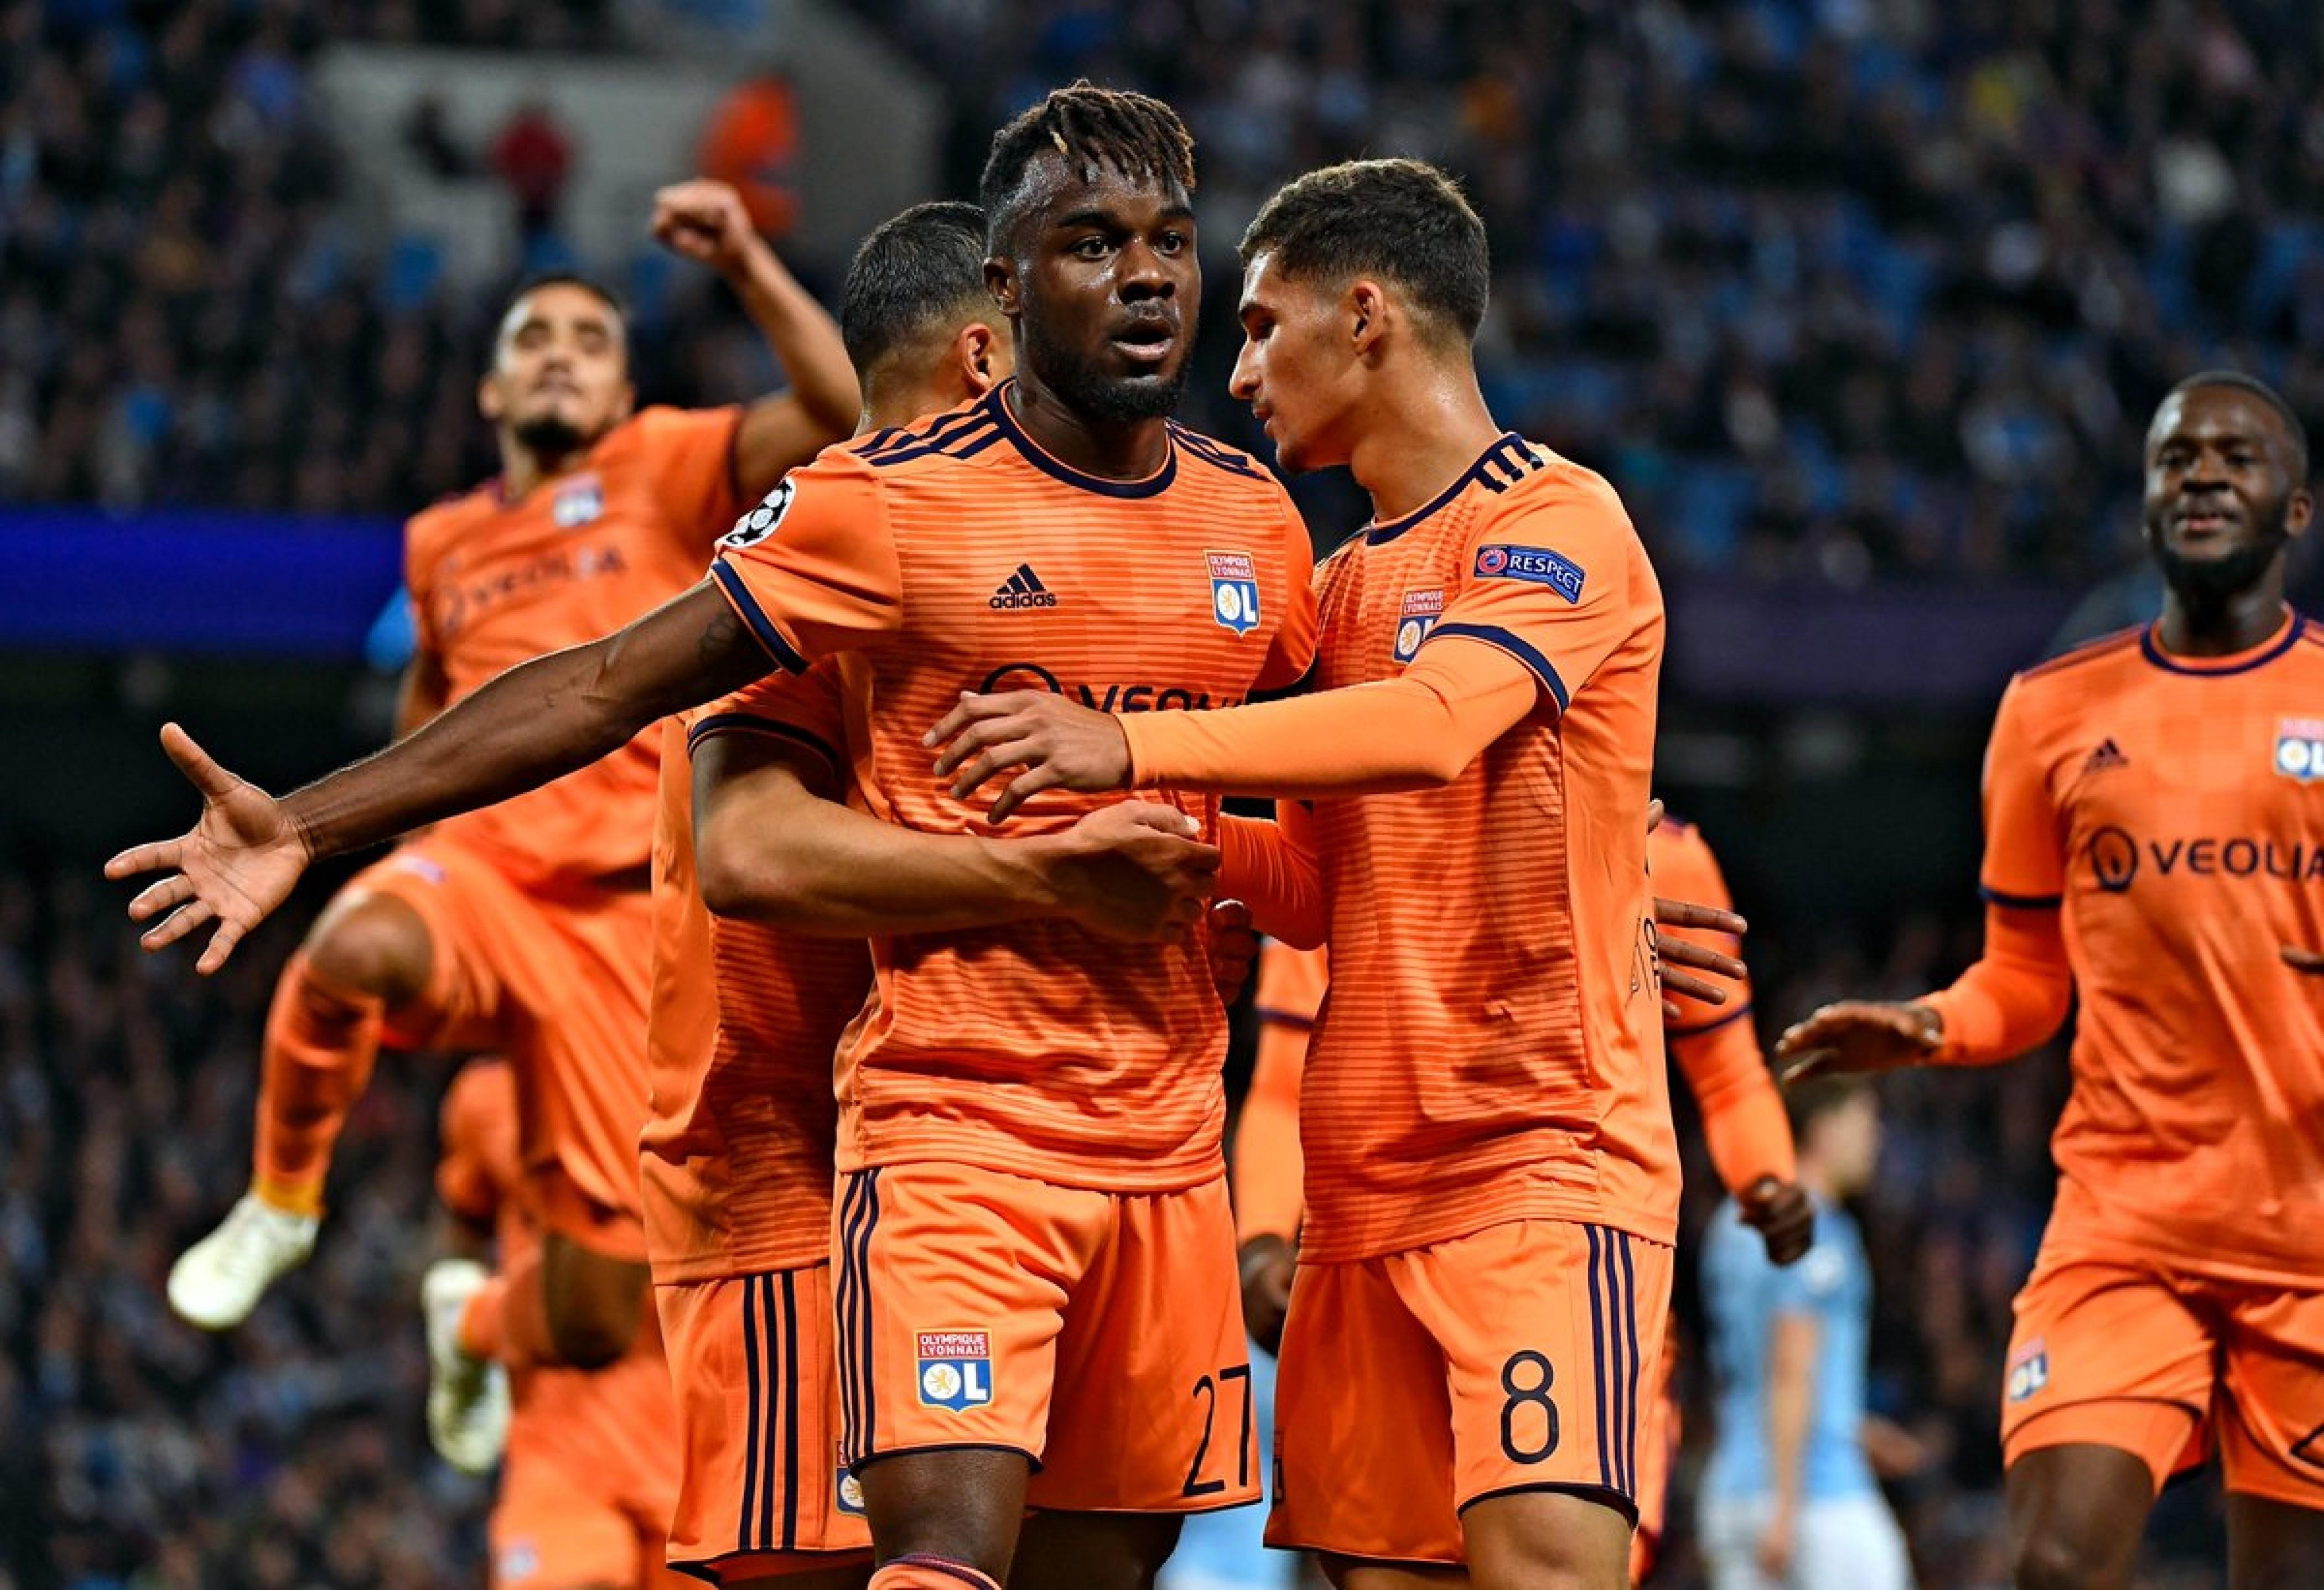 Champions League - Clamoroso all'Etihad Stadium, il Lione sbanca Manchester, City battuto 2-1